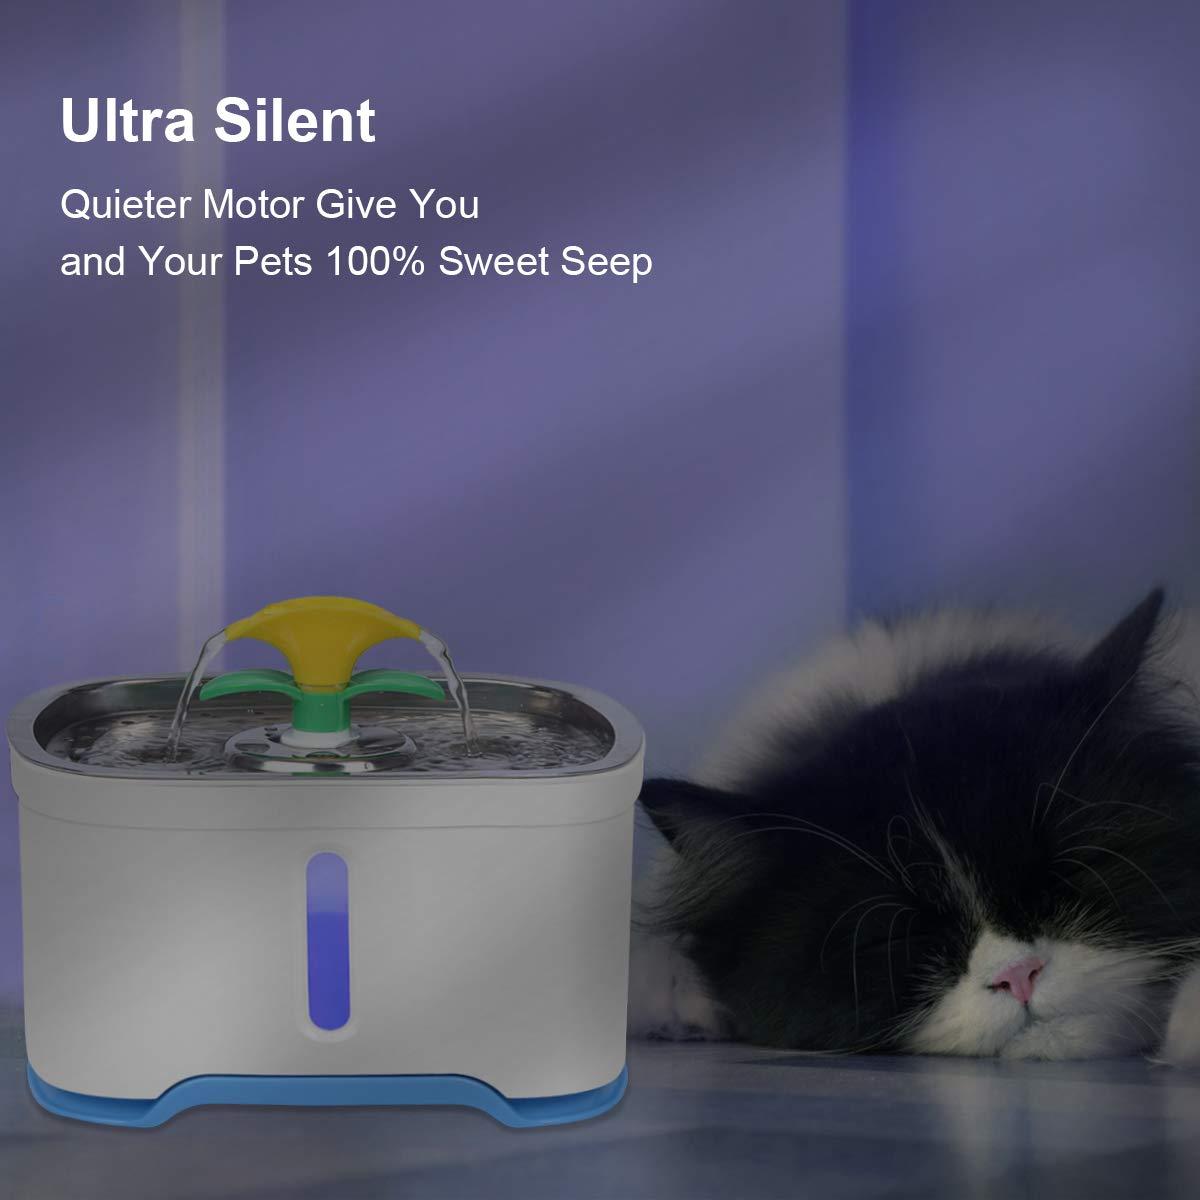 Mascotas m/últiples RIOGOO Fuente de Agua para Gatos dispensador de Agua para Fuente de Agua para Perros s/úper silencioso para Gatos Bomba de Apagado autom/ático de 84 oz // 2.5L Perros